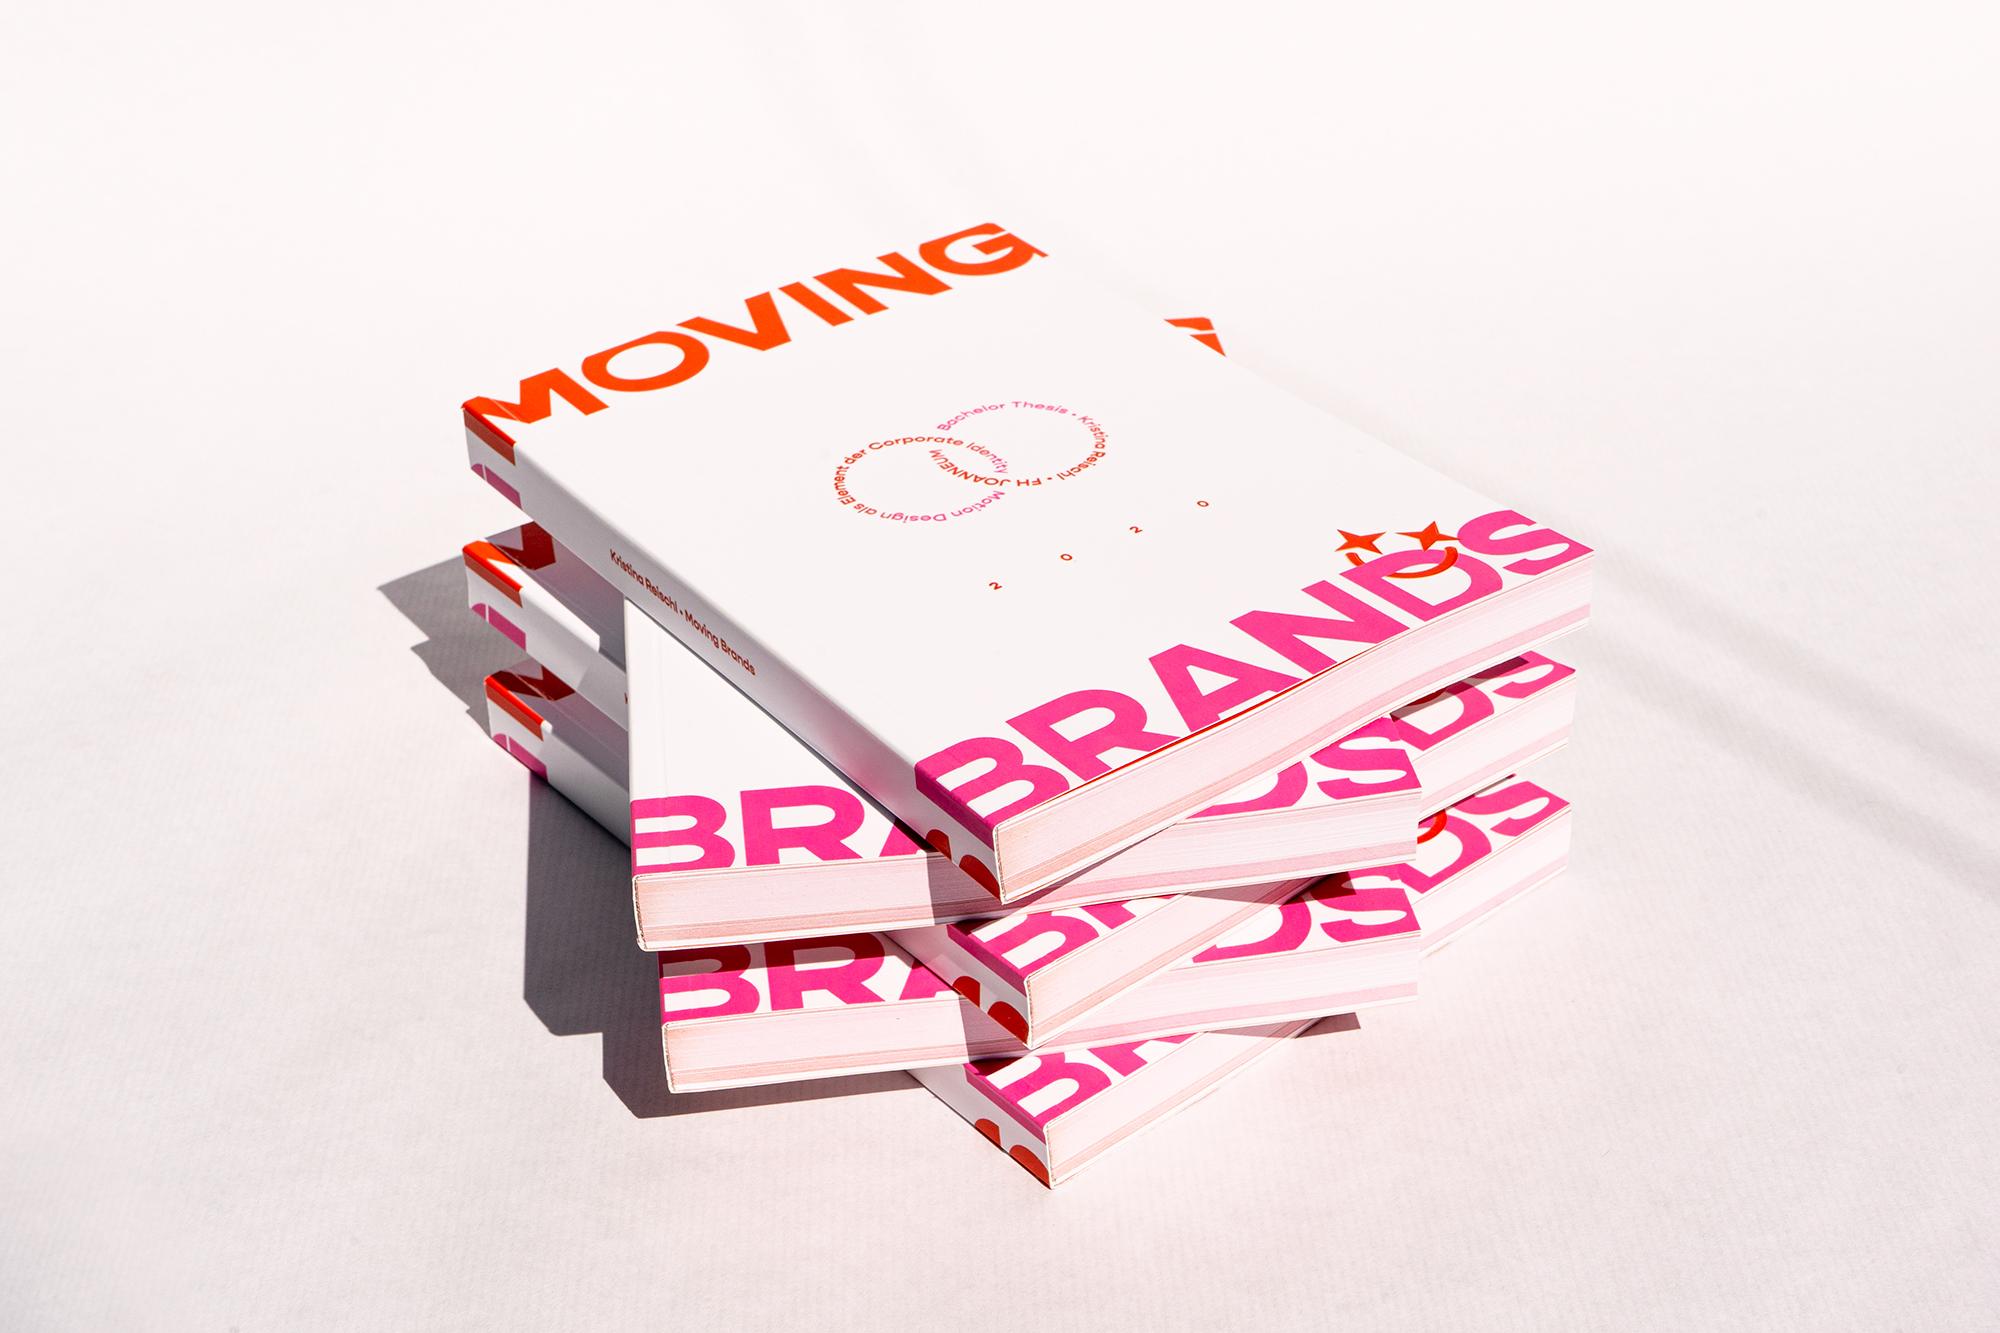 FH-JOANNEUM_IND17_Kristina-Reischl_Bakkarbeit_MovingBrands_10